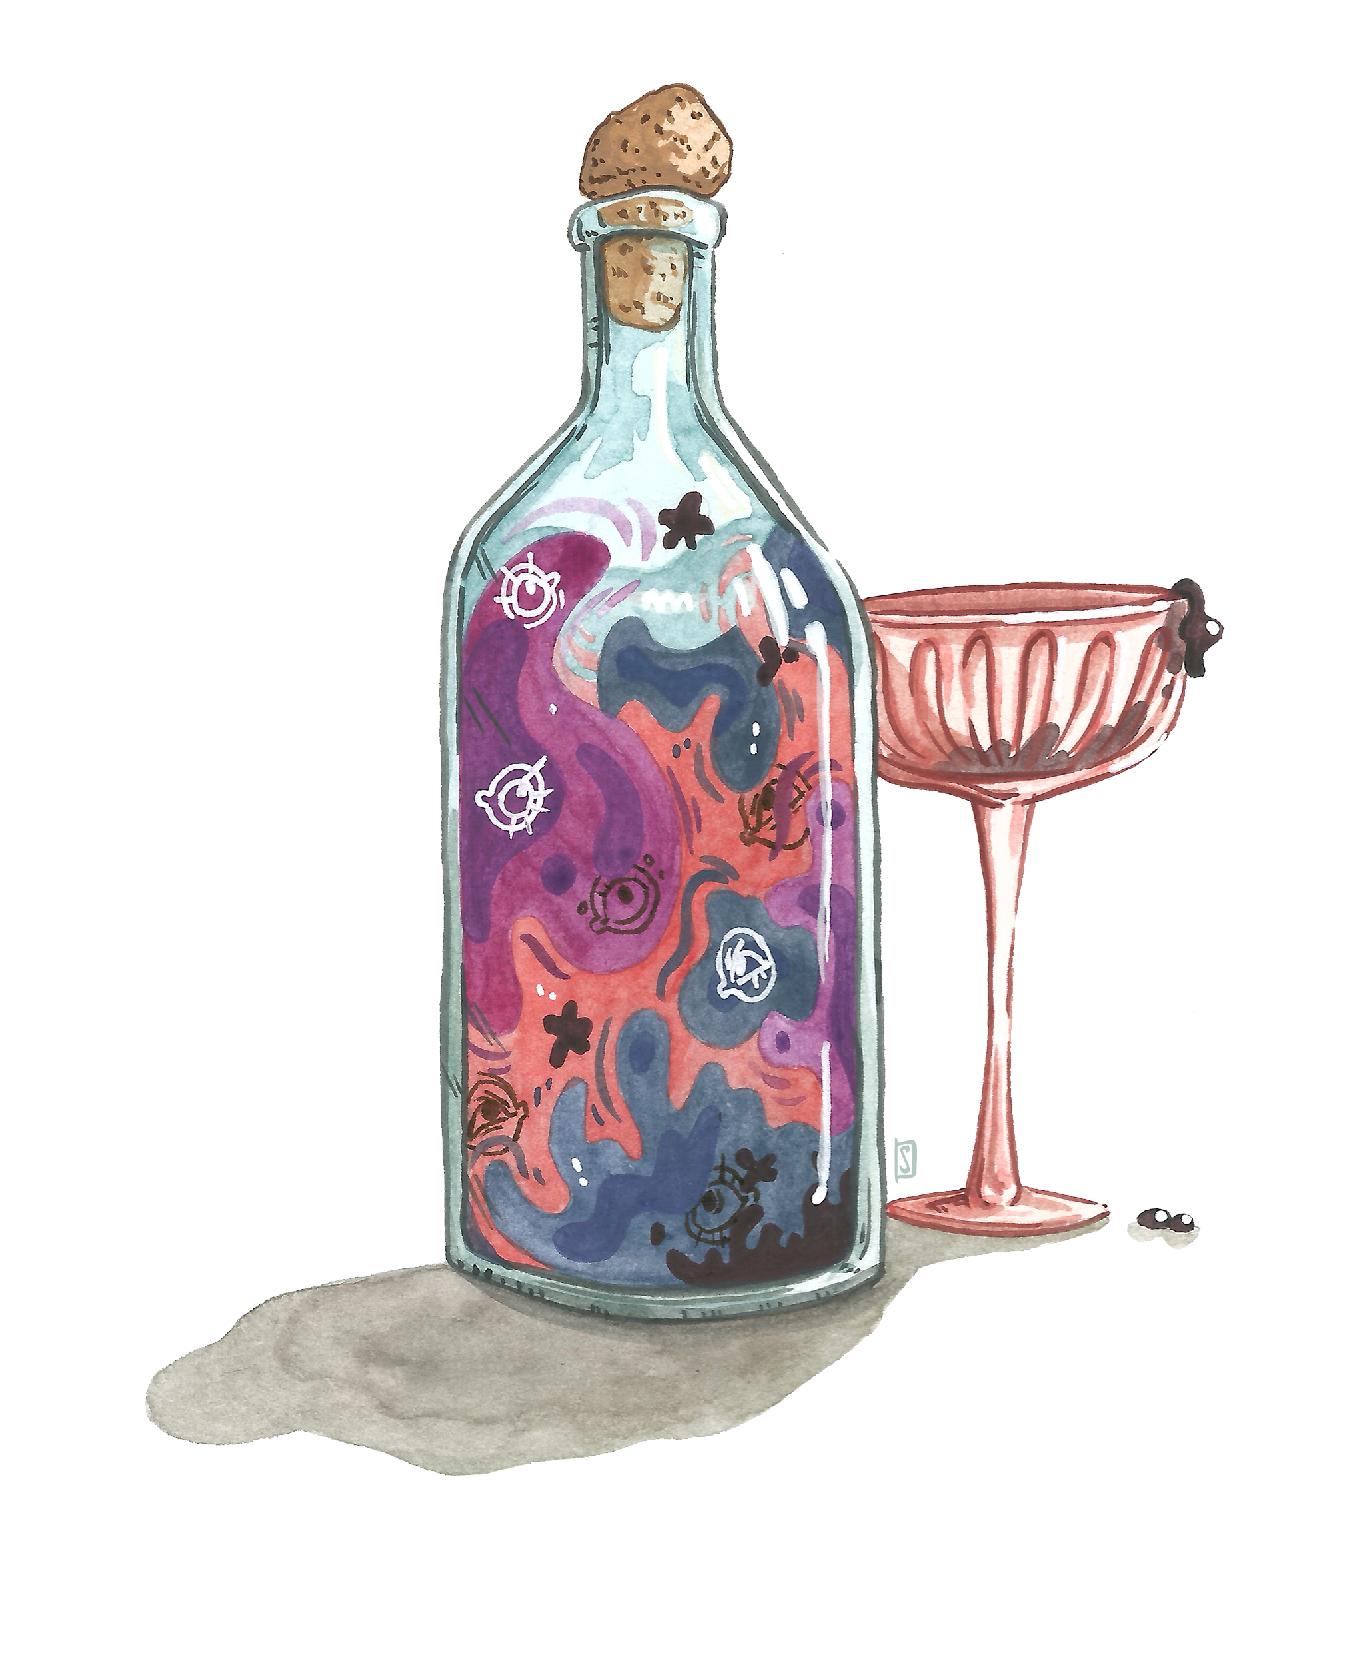 Alcohol spirits